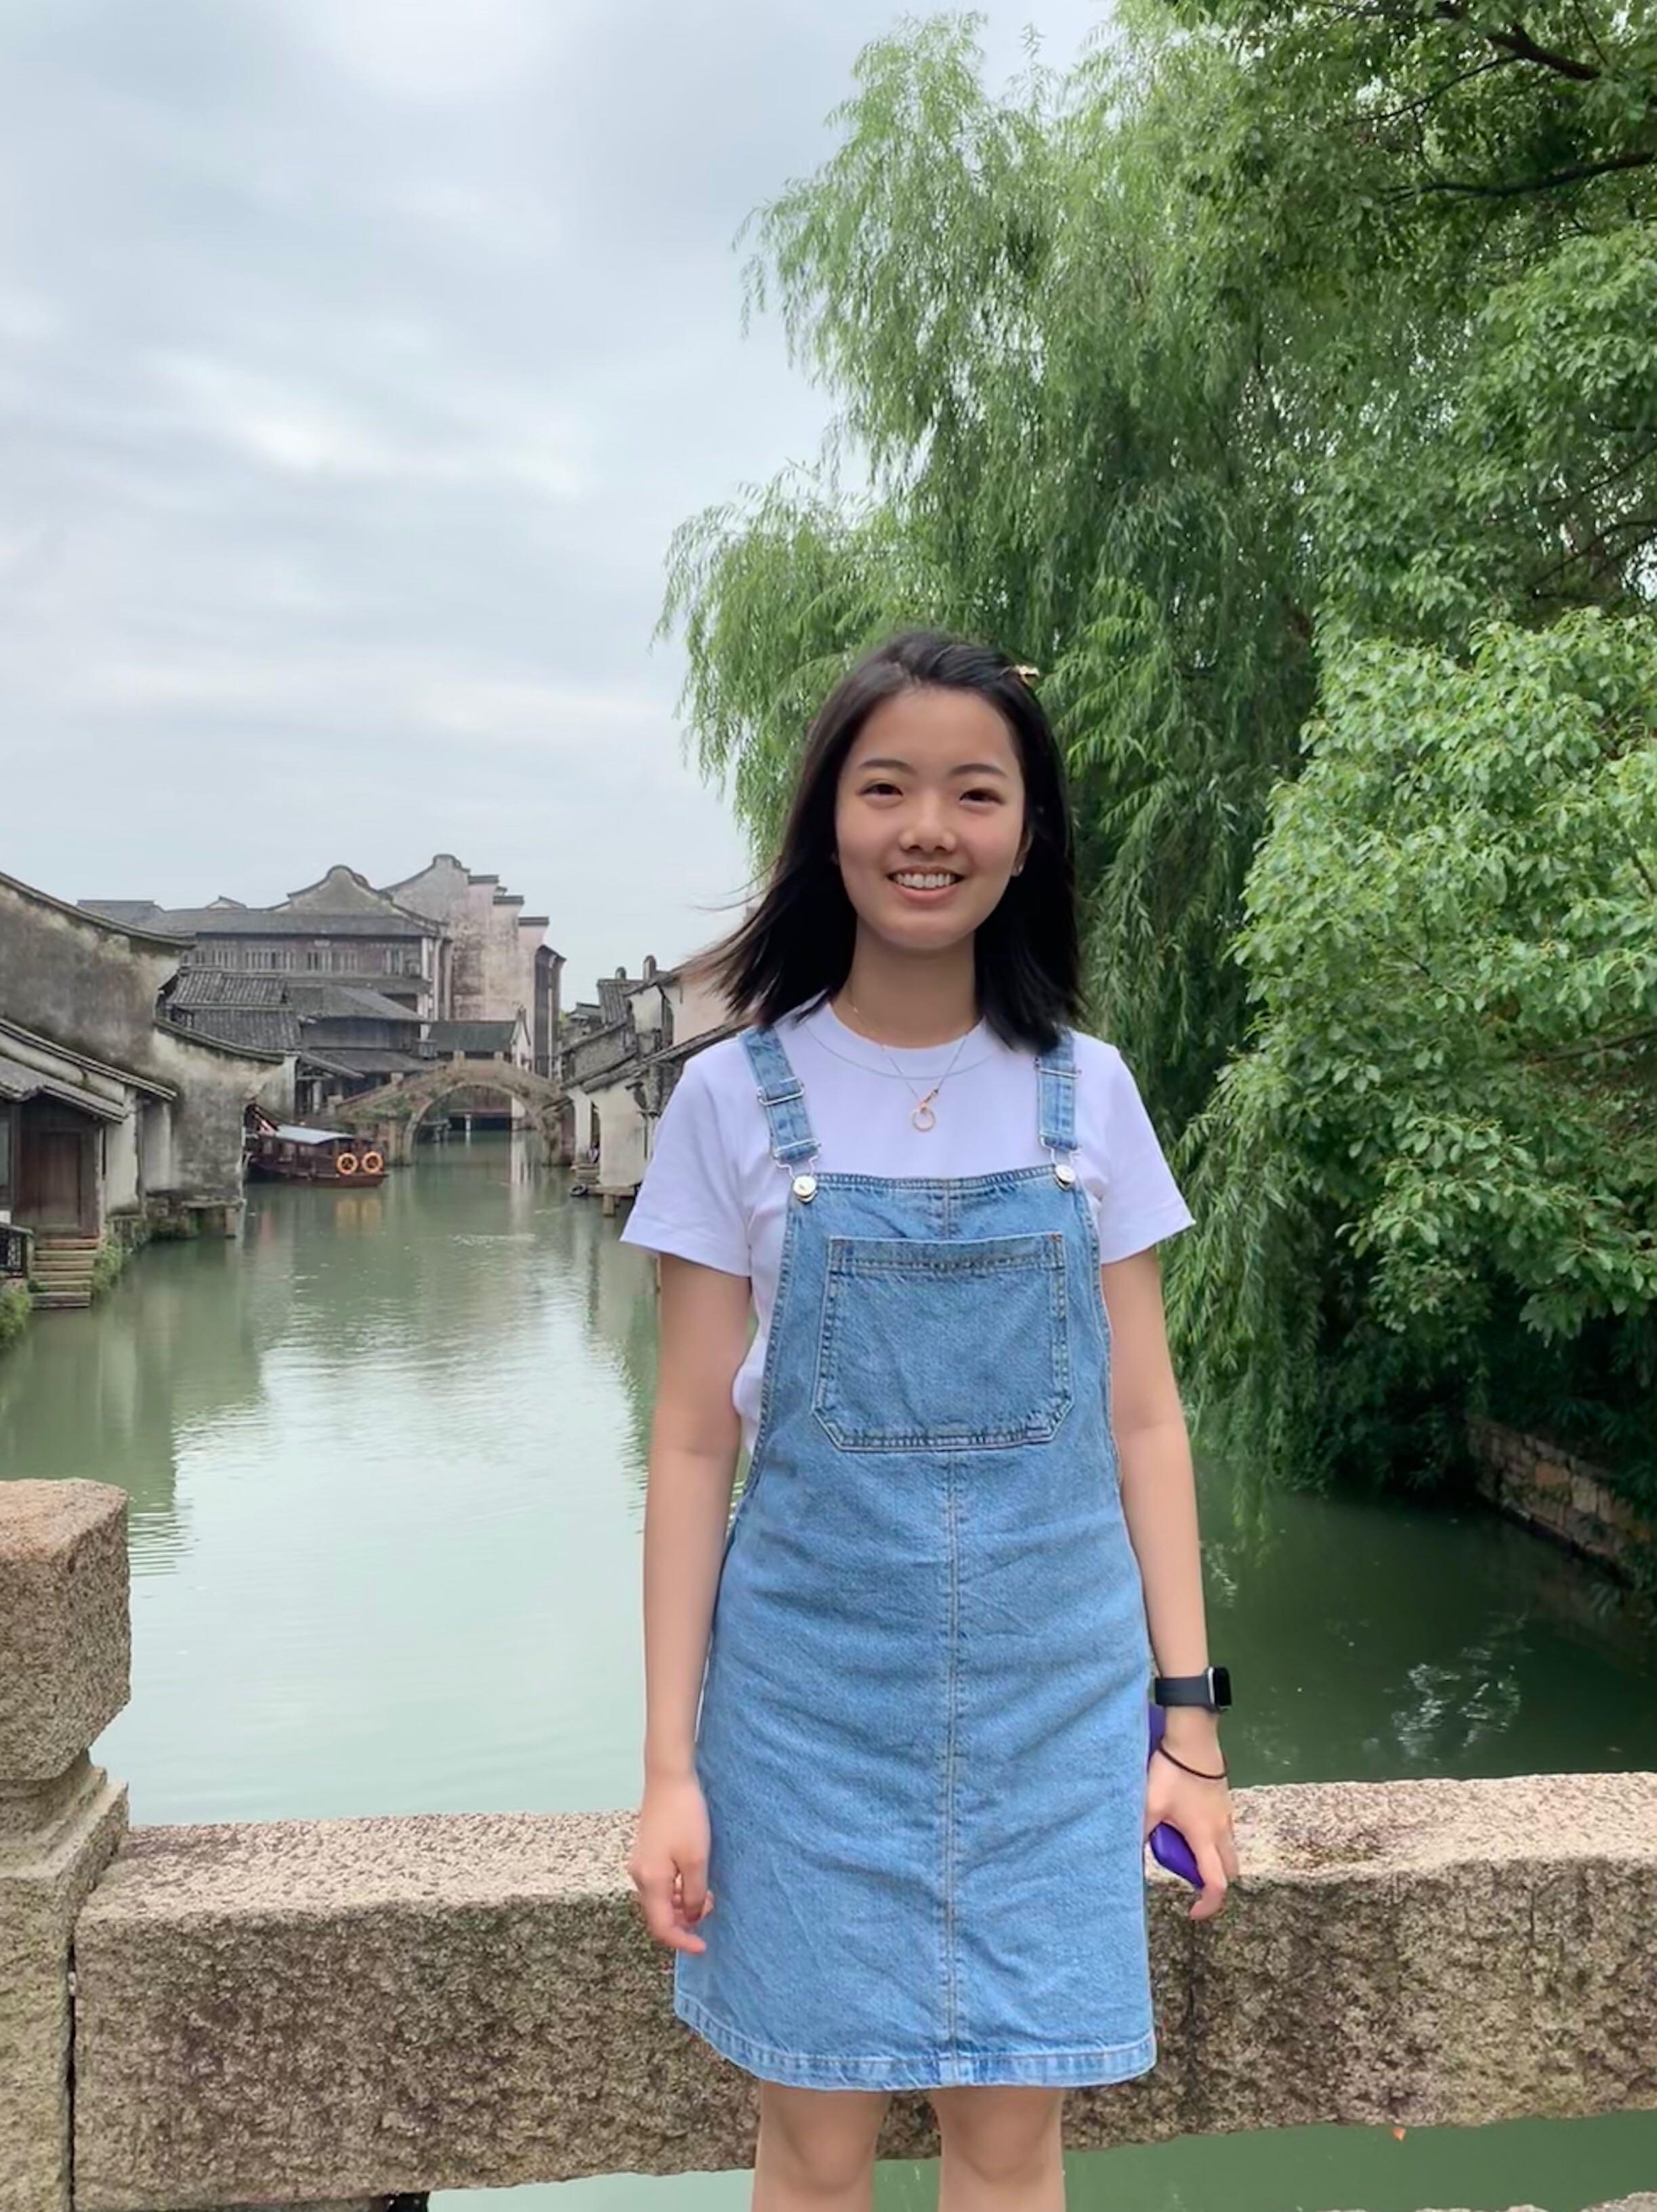 Leyang Ji's reflective essay on her KURF summer internship